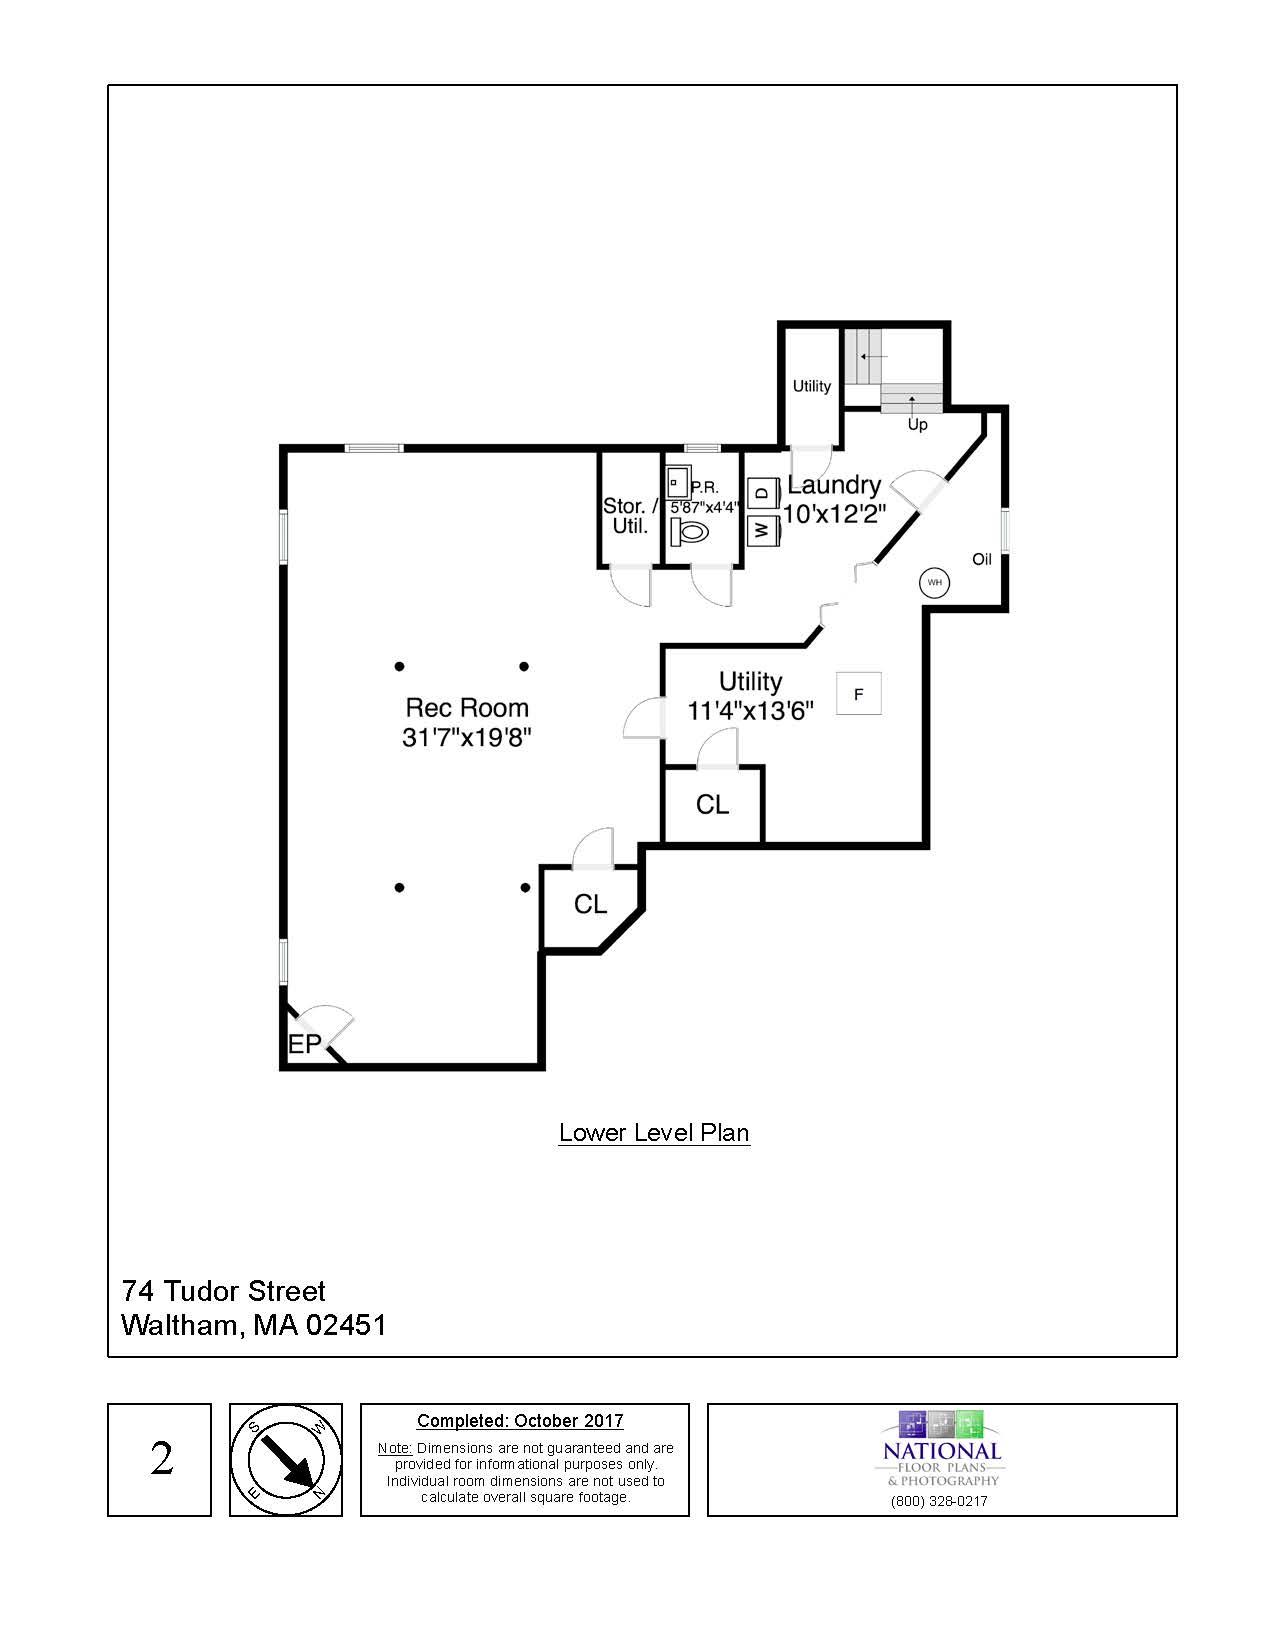 74 Tudor Street, Waltham - Lower Level Floor Plan